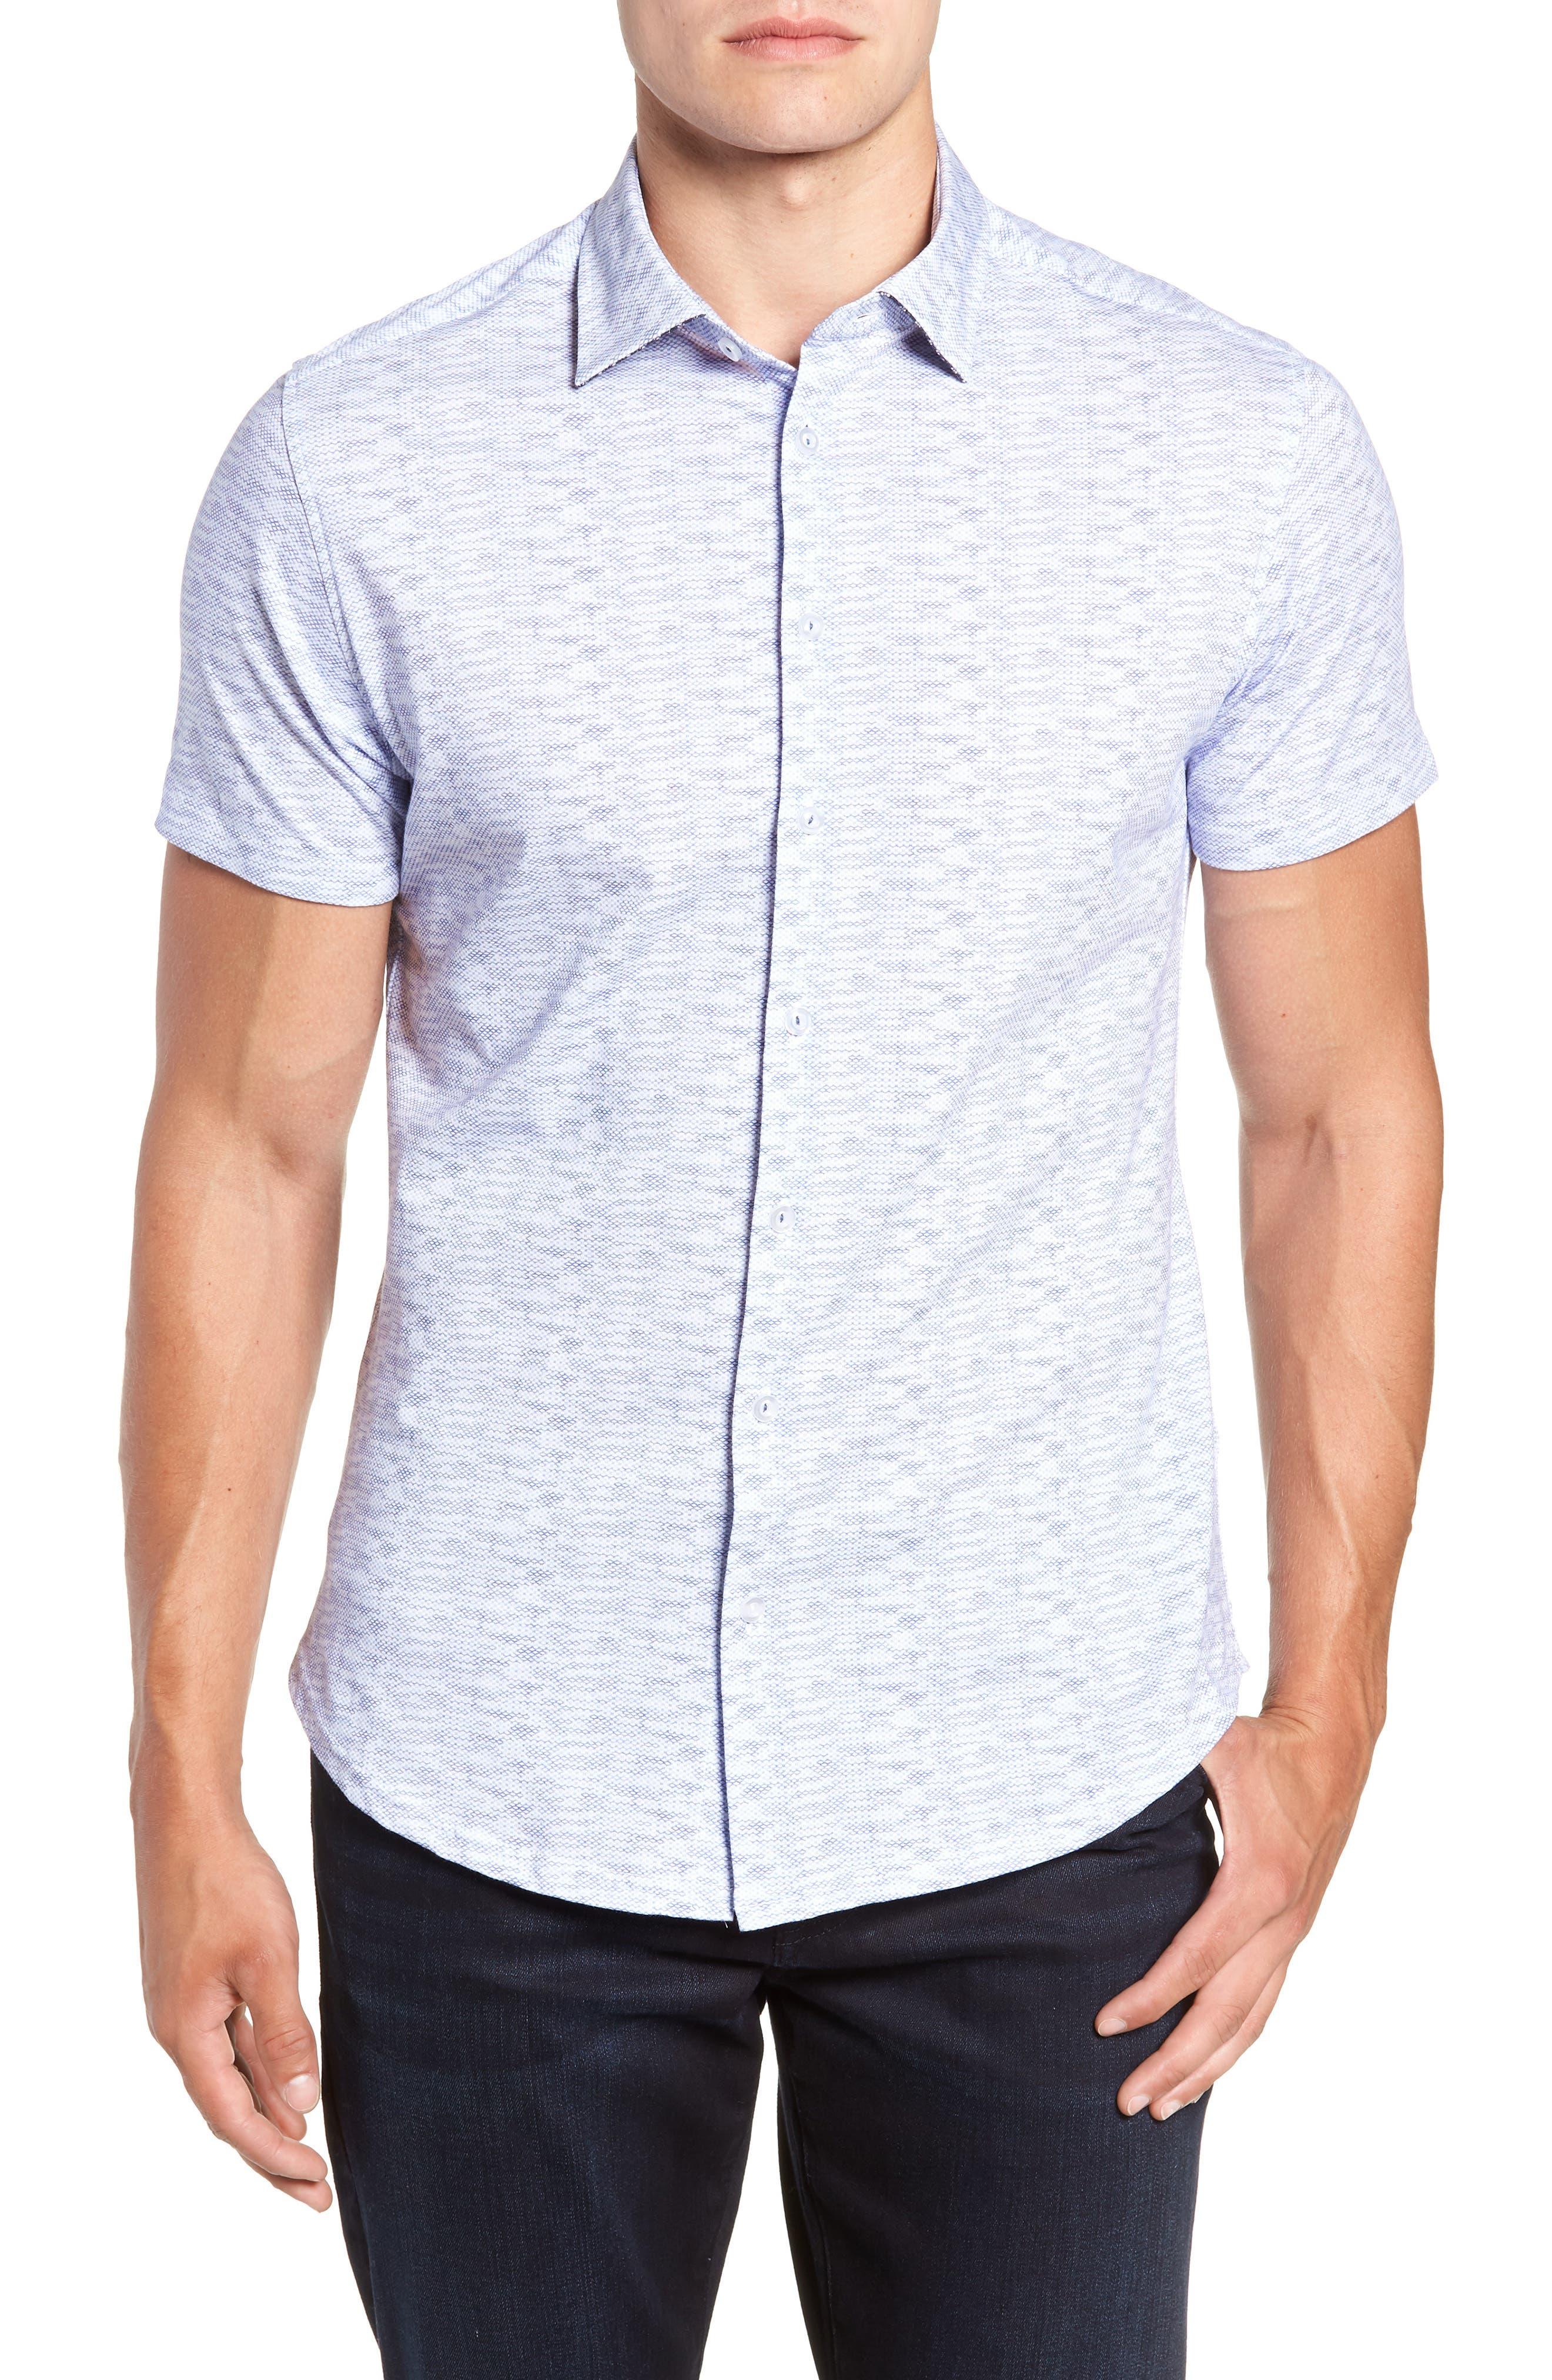 Heather Regular Fit Knit Sport Shirt,                             Main thumbnail 1, color,                             400